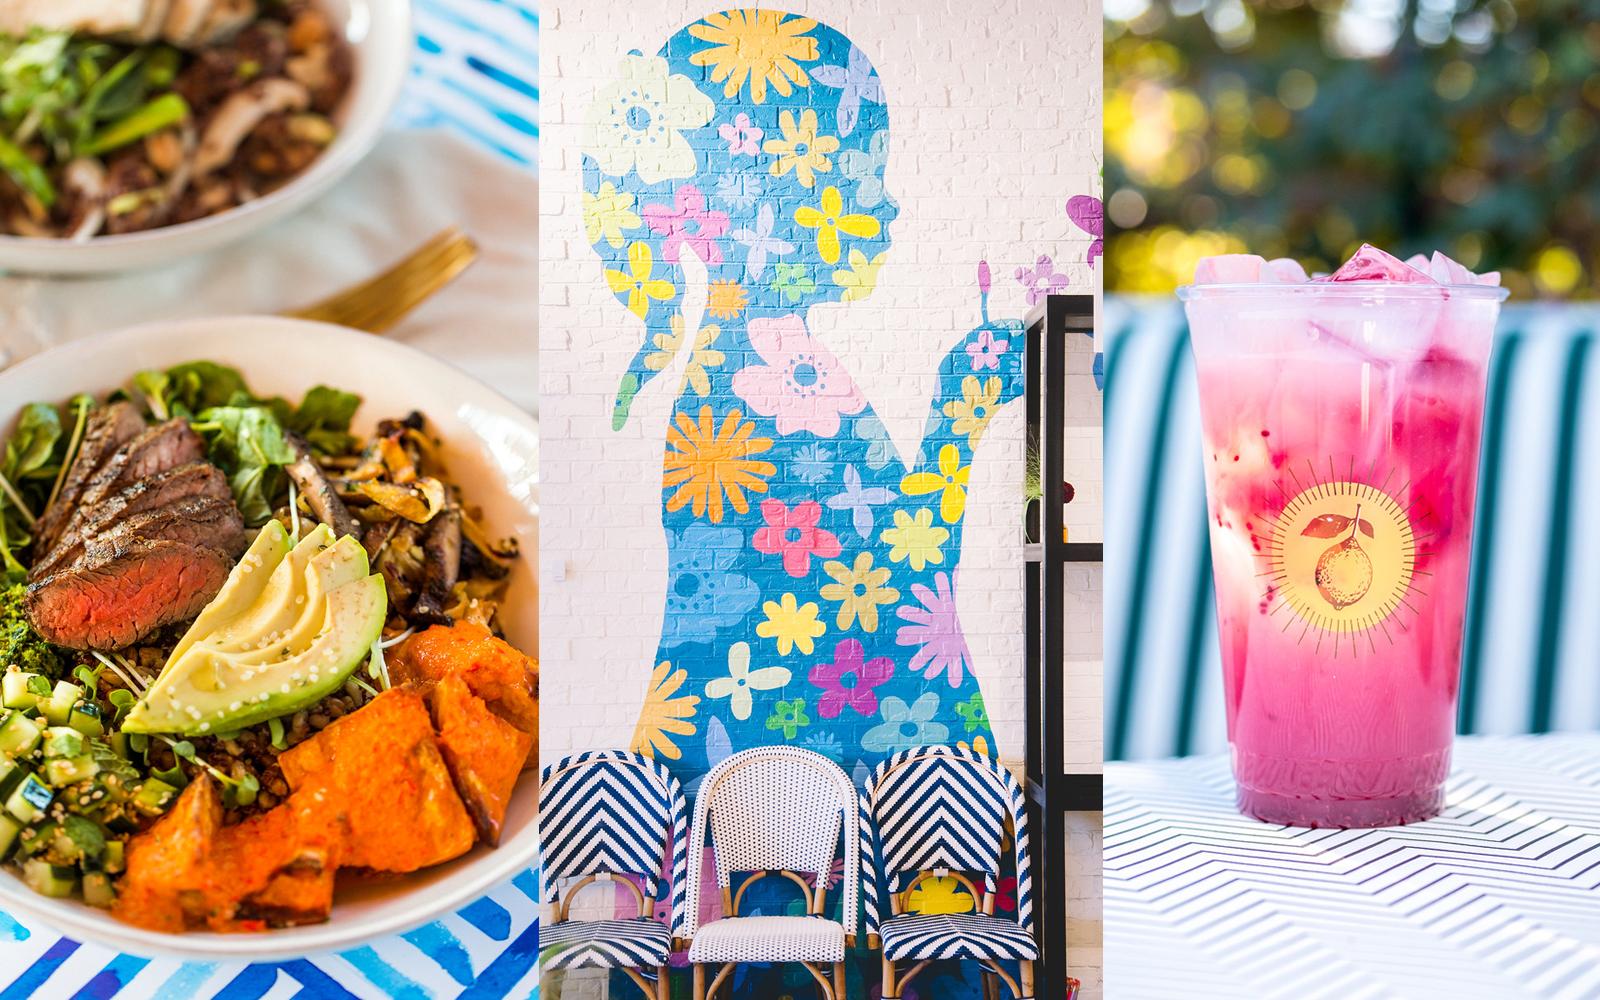 Avocado steak bowl, wall mural, and pink lemonade at Flower Child.